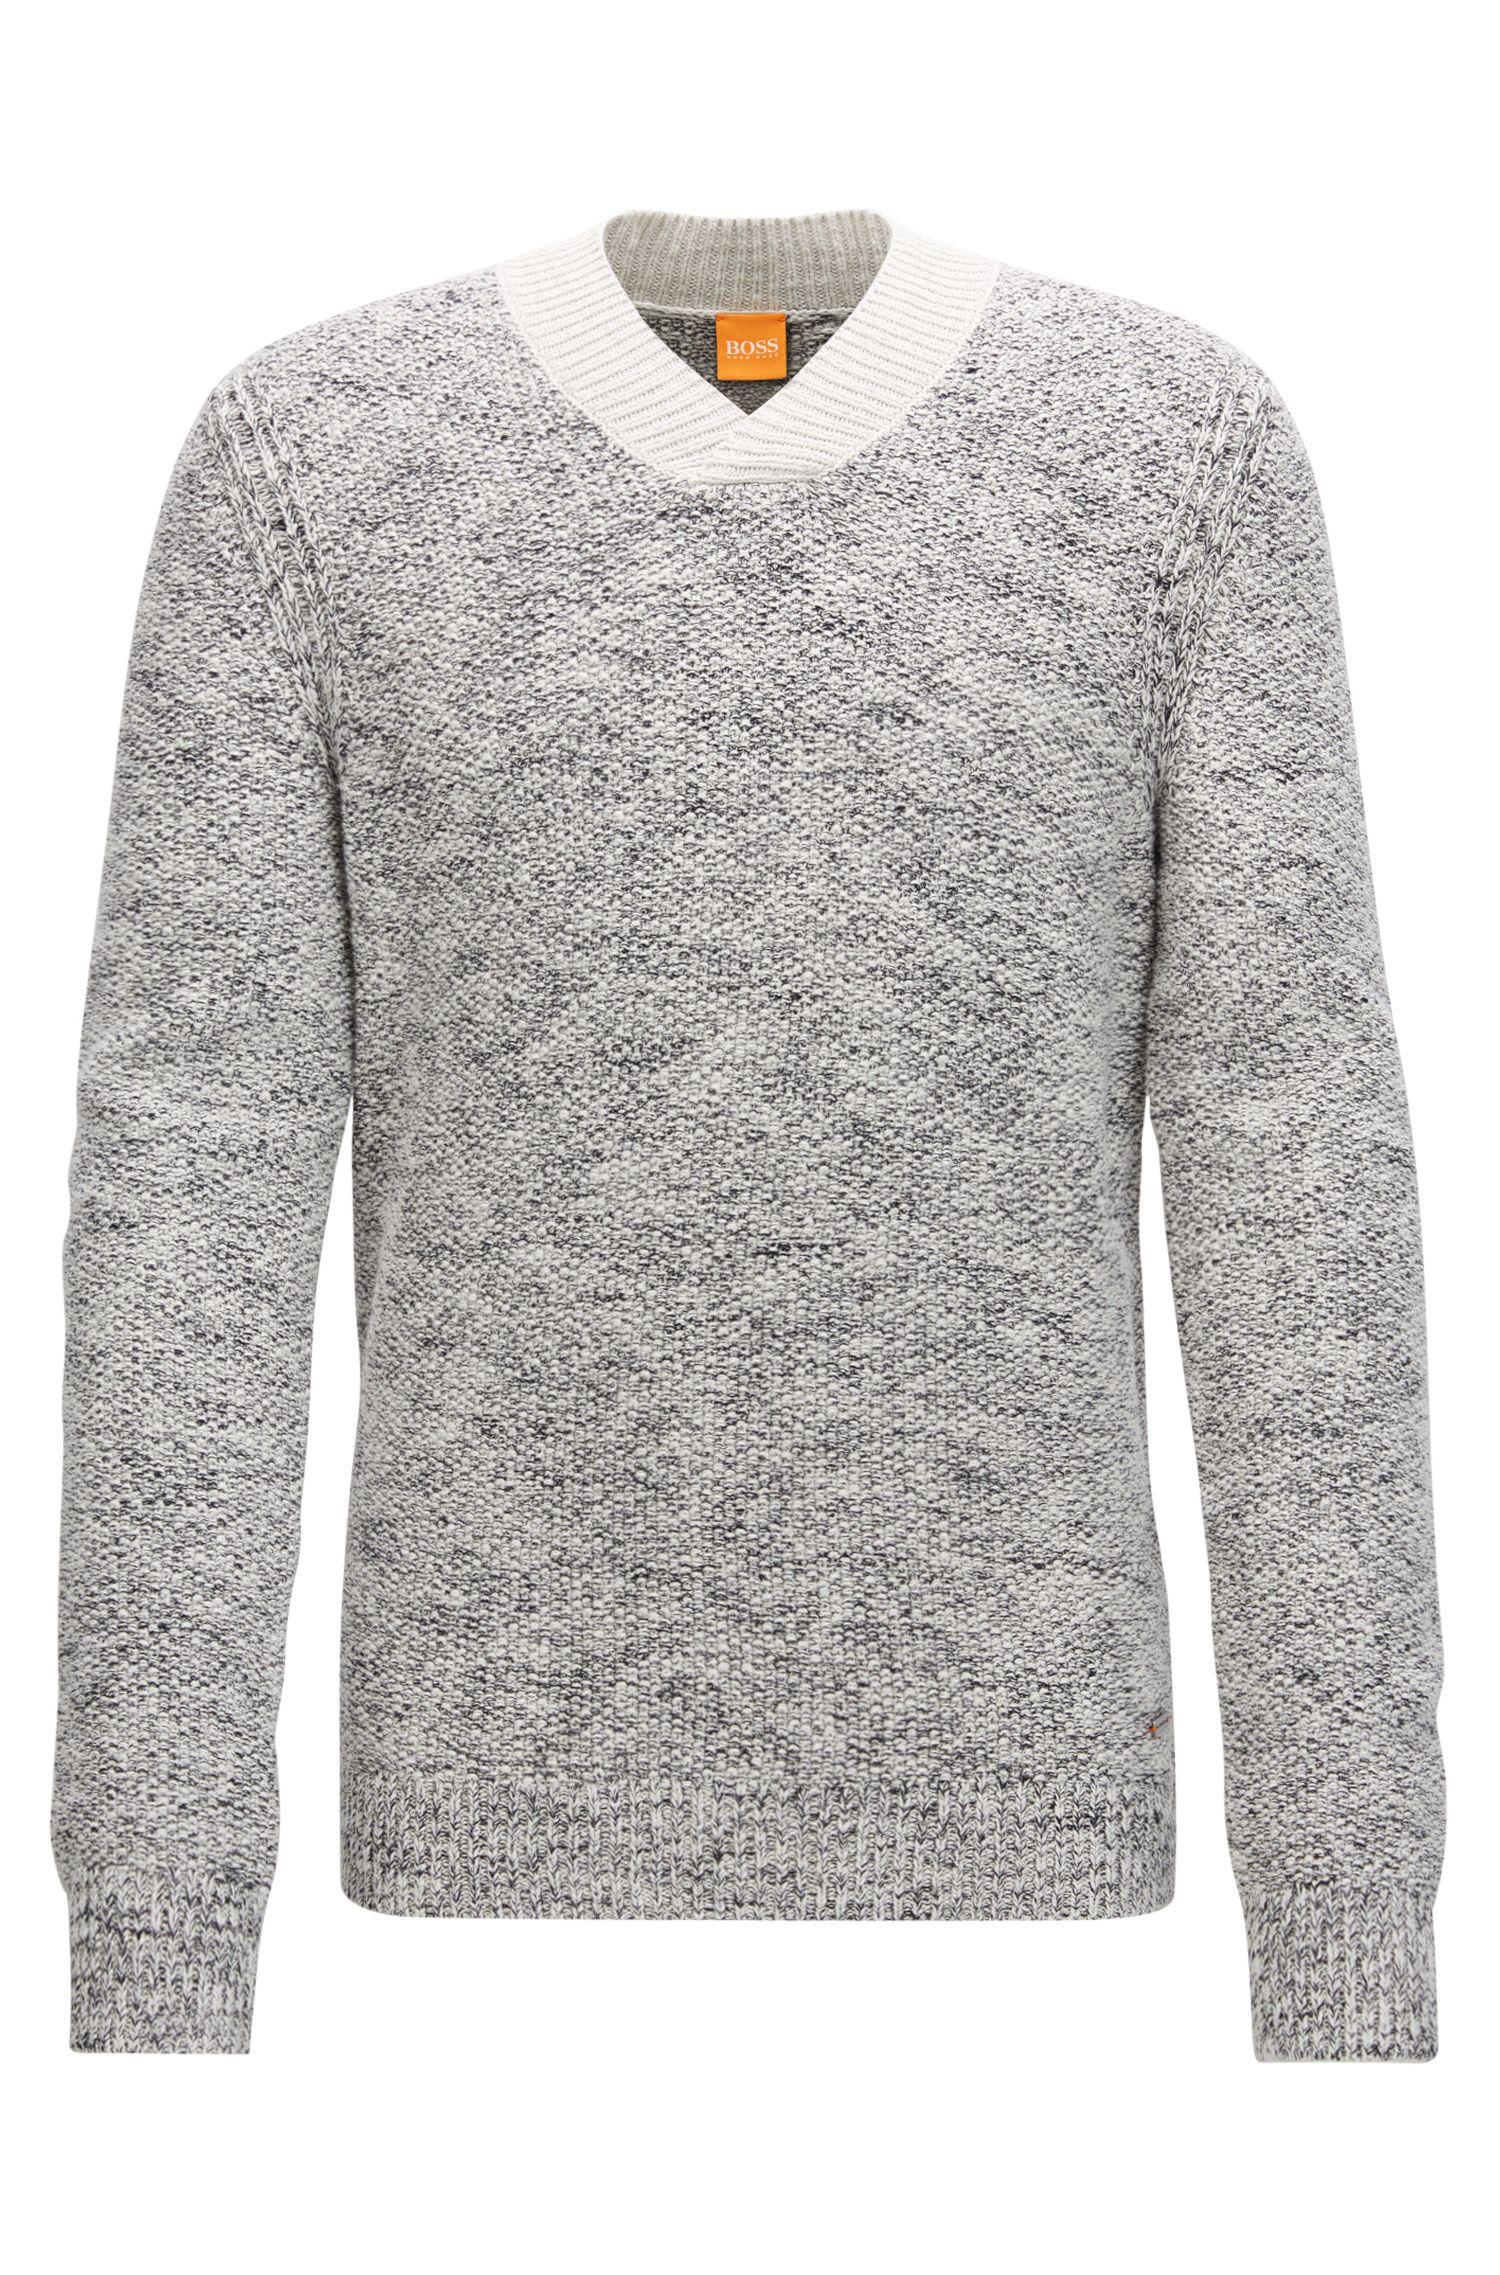 Mouline Knit Cotton Sweater | Amoulet